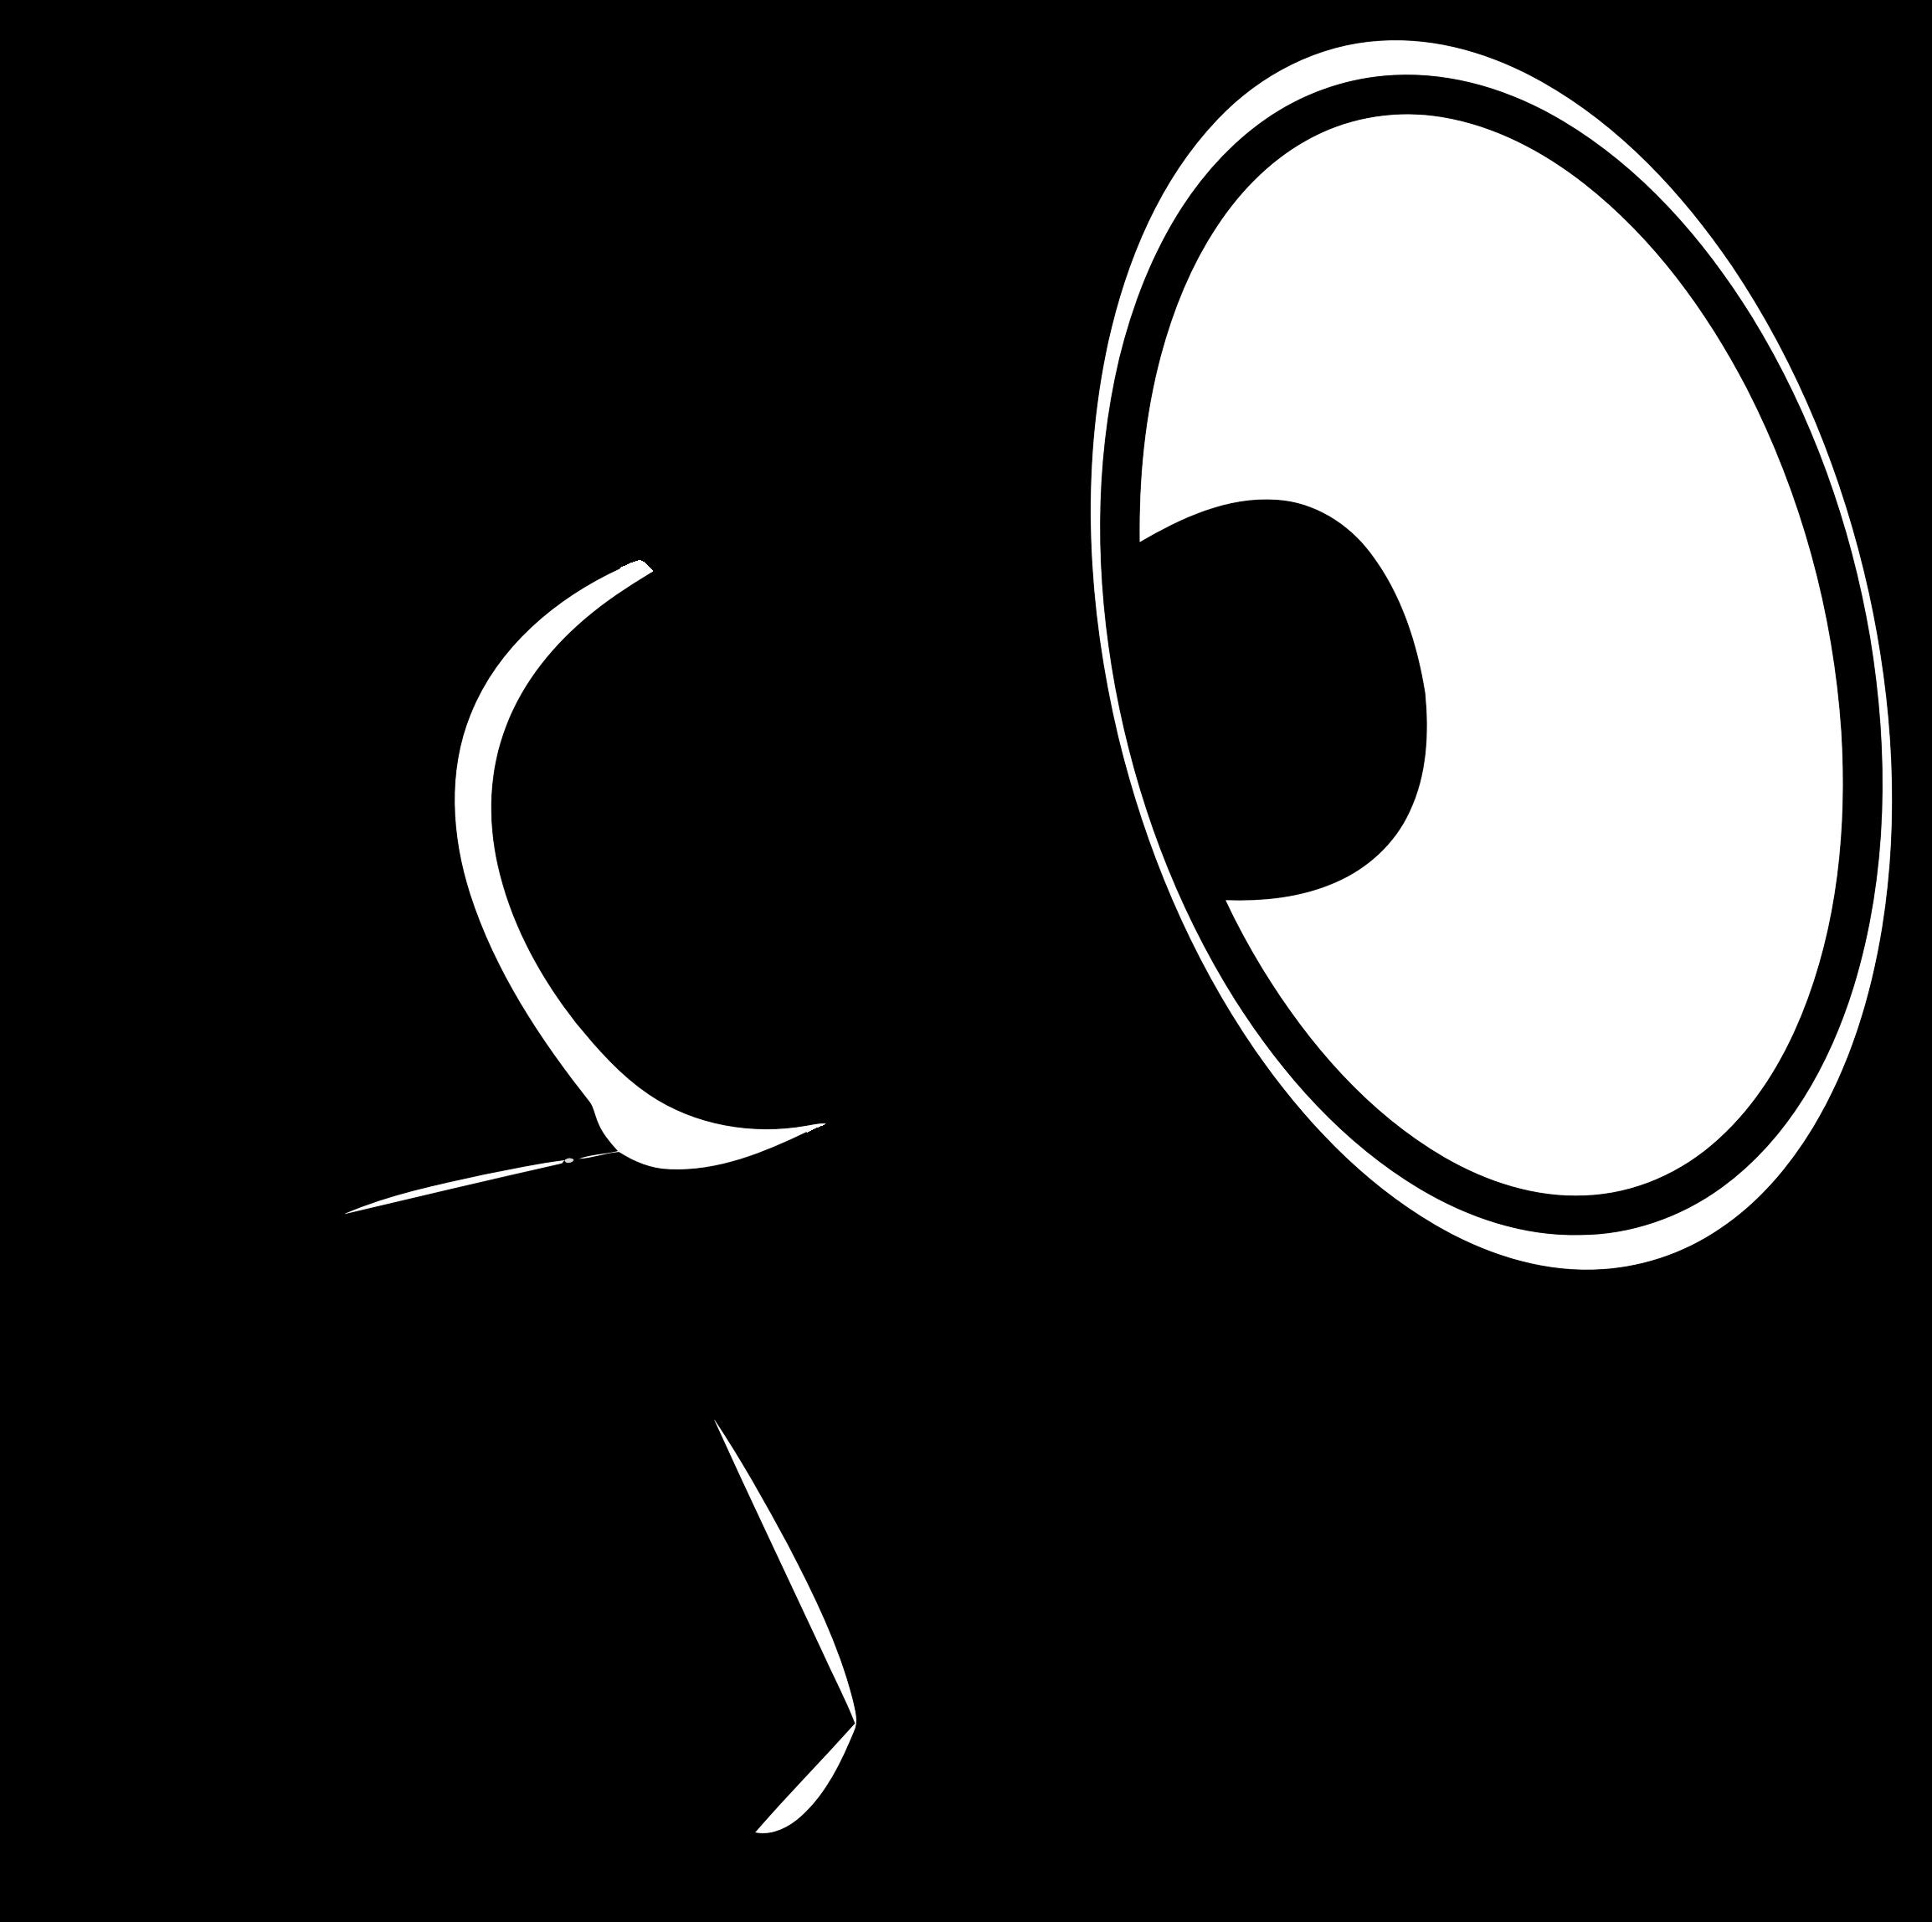 Movies clipart megaphone. Jokingart com